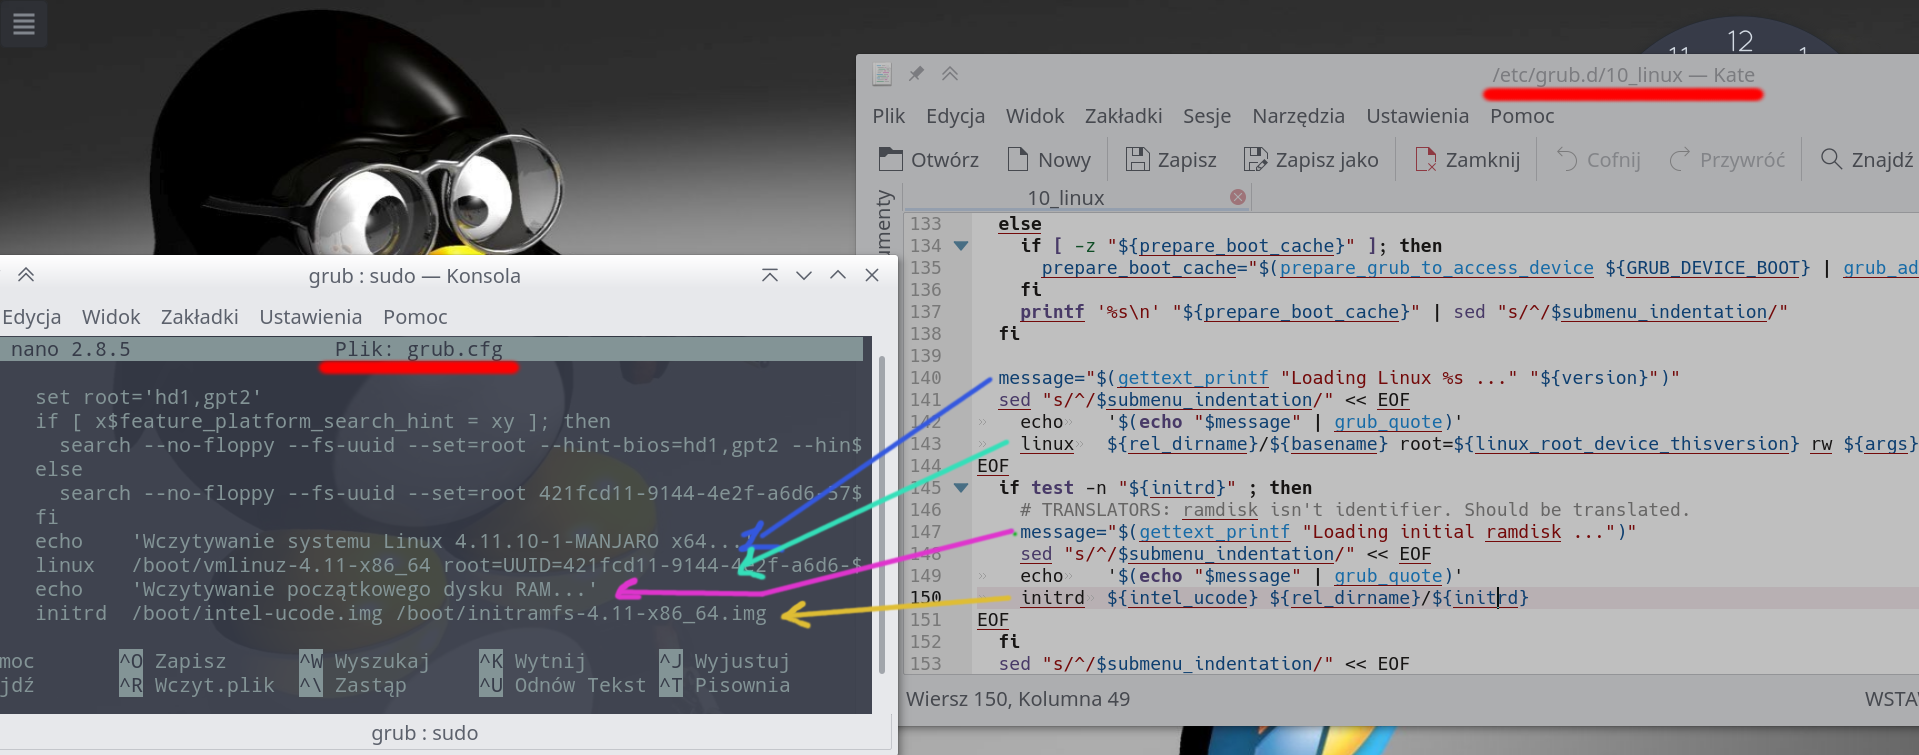 Manjaro i Opensuse na jednym dysku - GNU/Linux